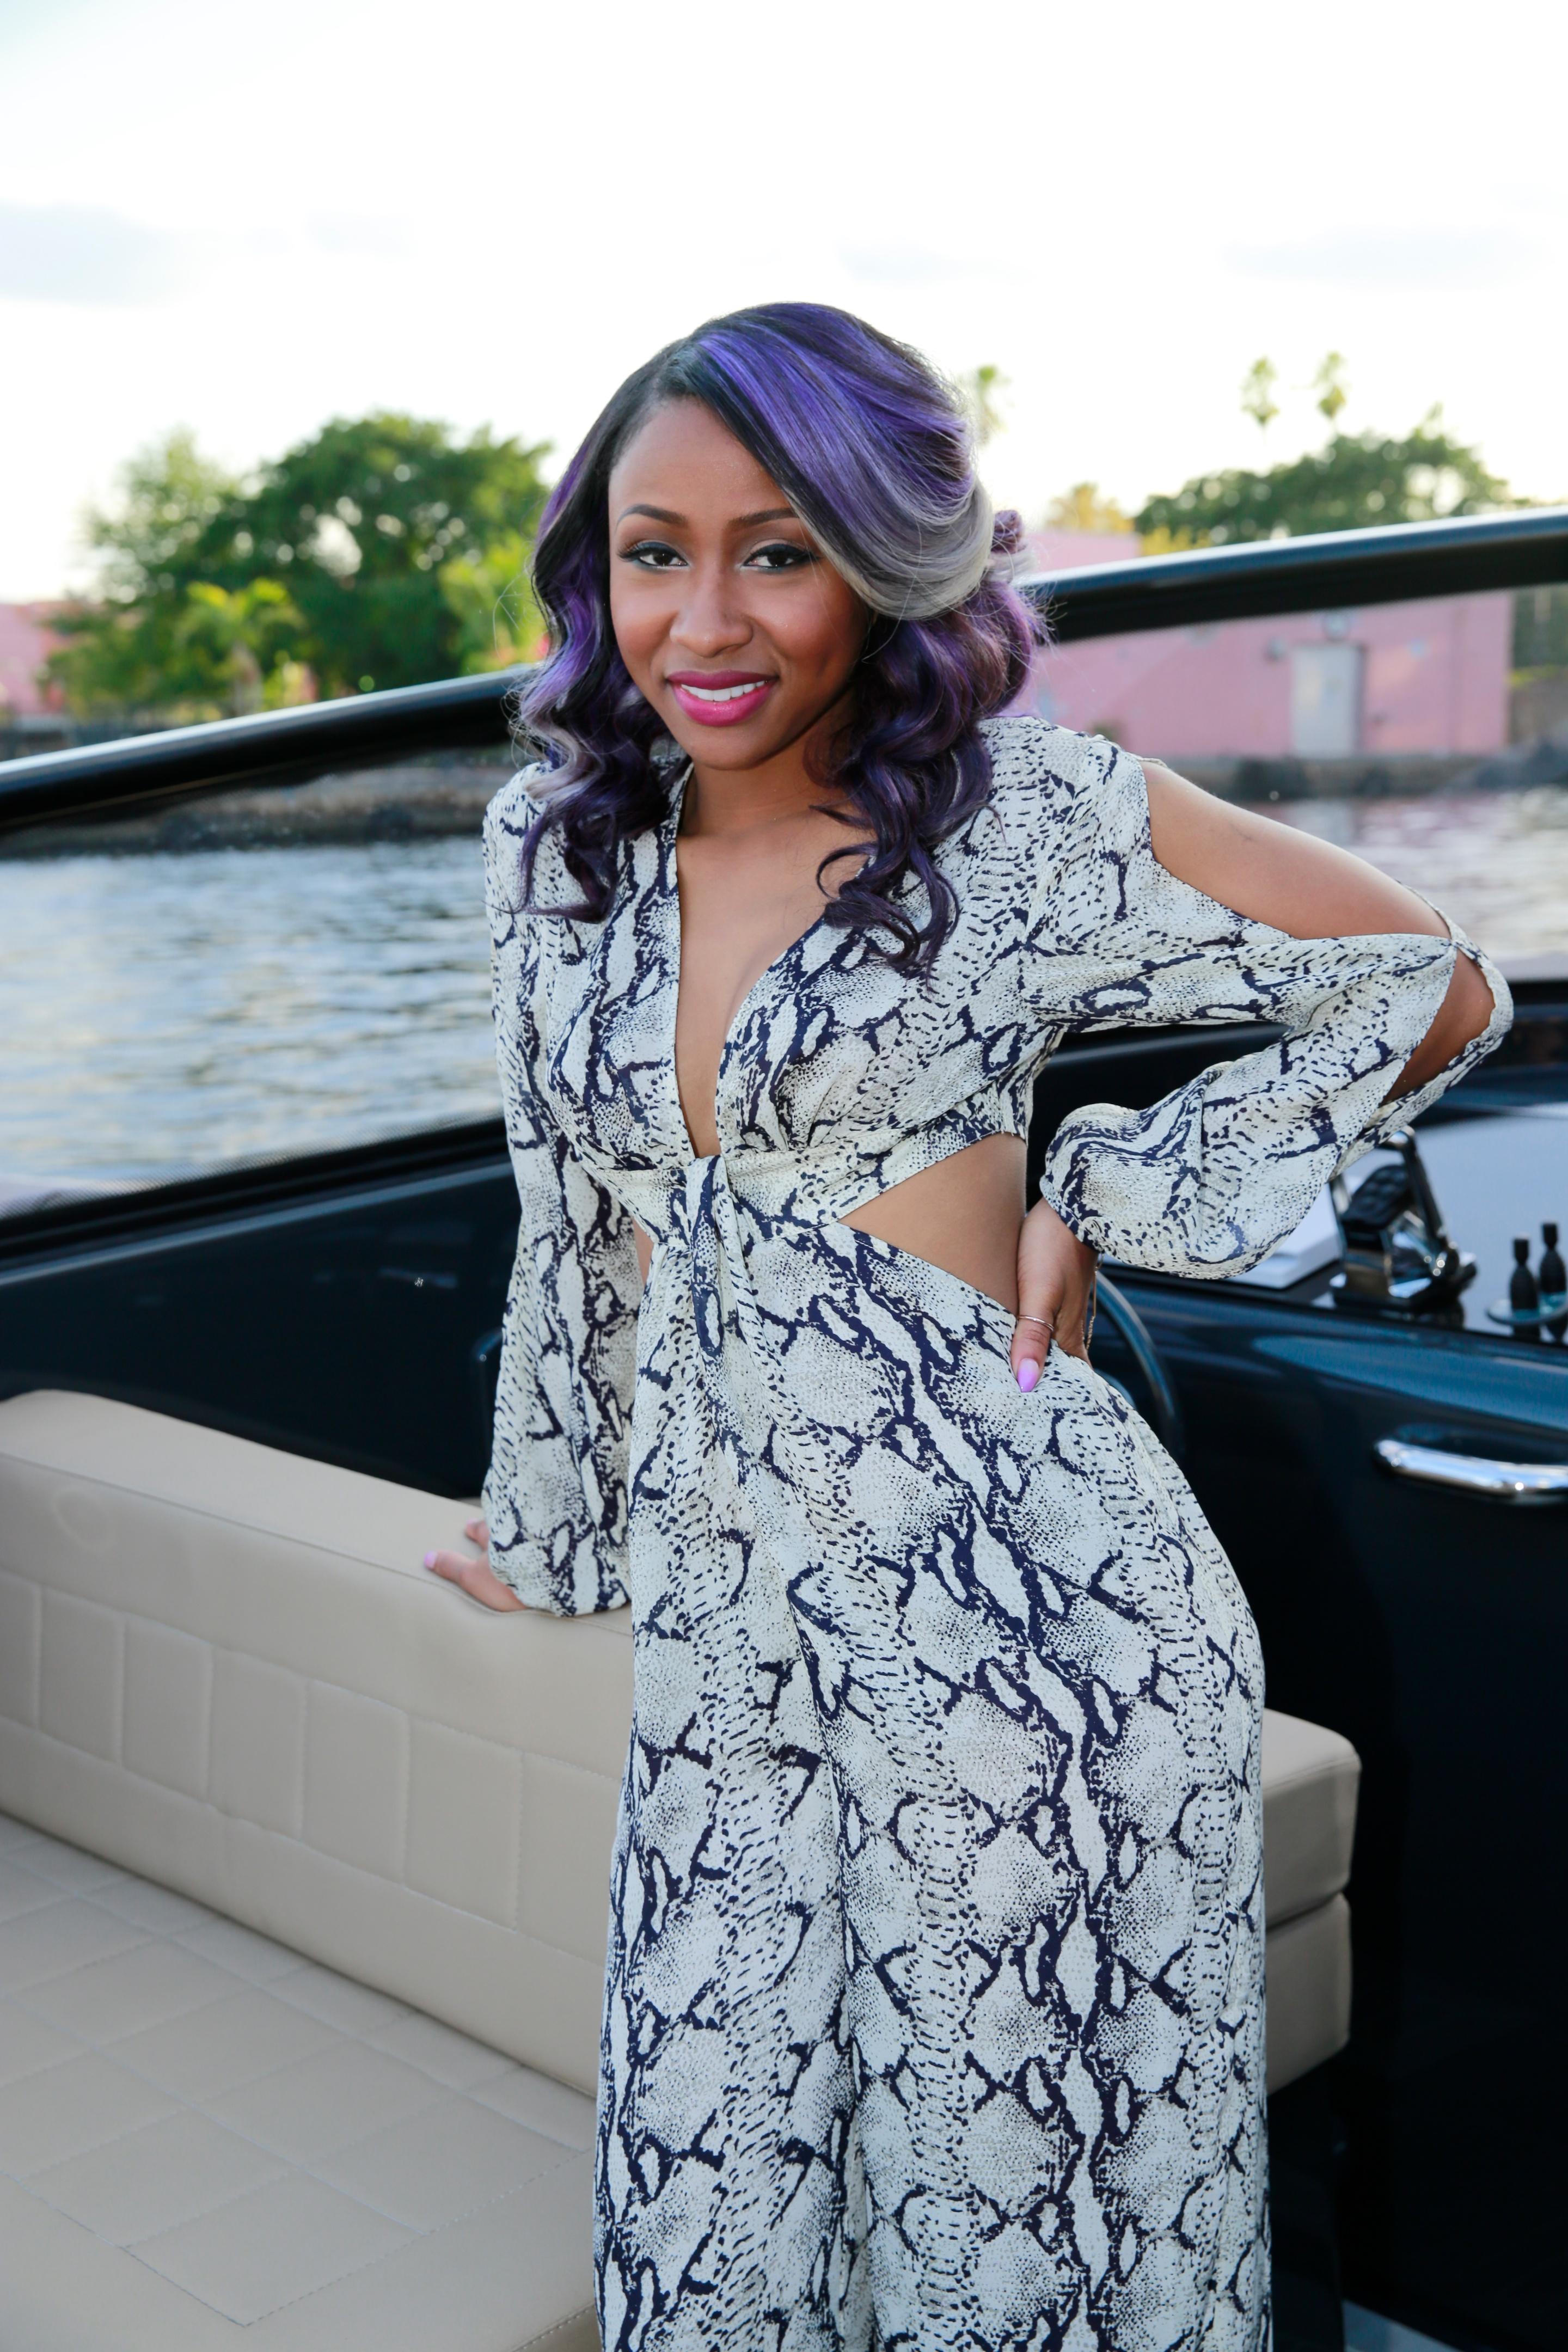 Celebrity Sightings At Seasalt And Pepper Restaurant - April 9, 2014